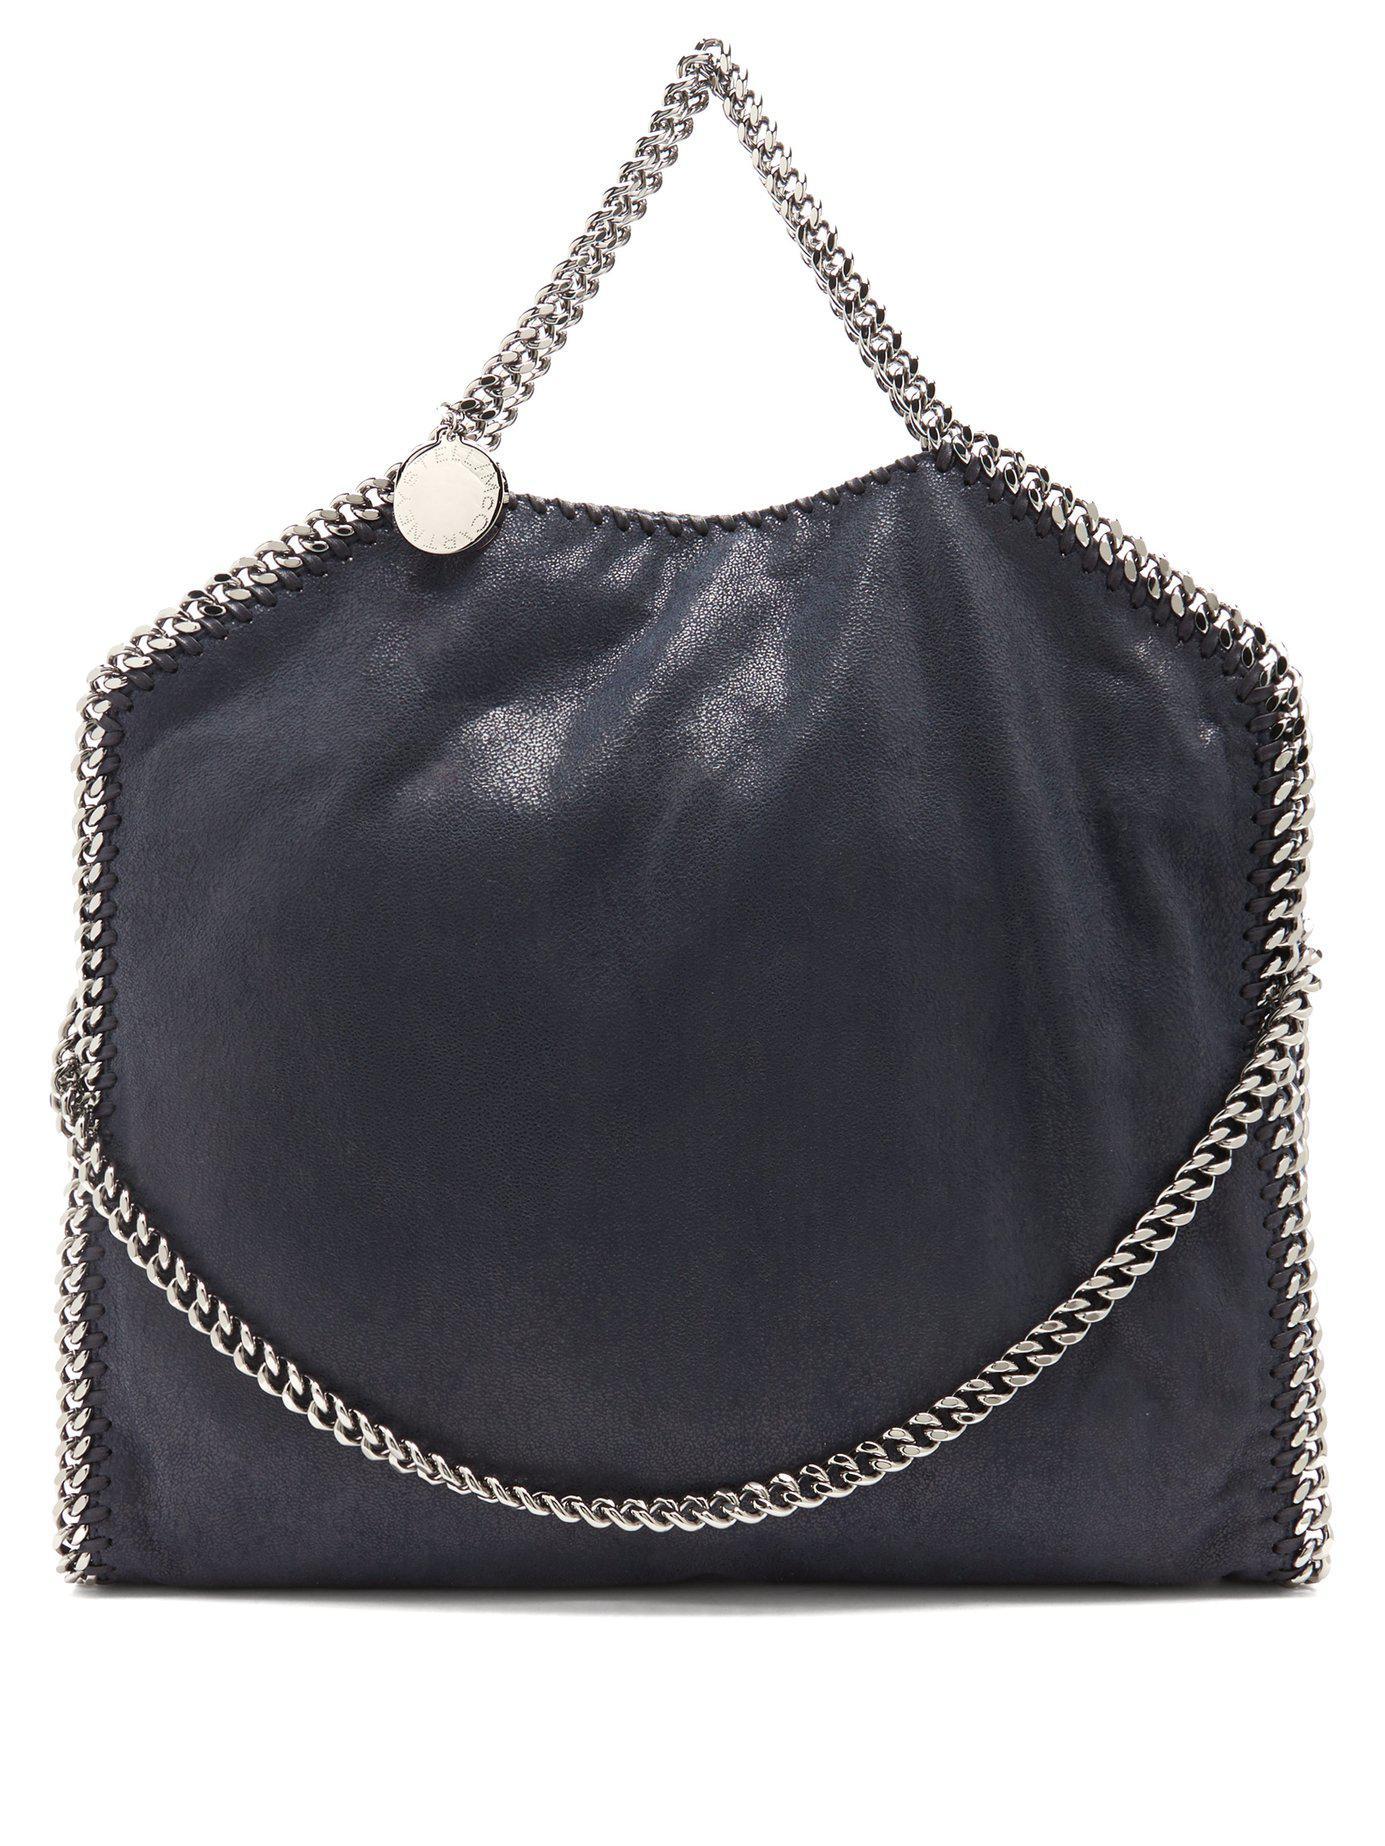 Lyst - Stella McCartney Falabella Faux Suede Shoulder Bag in Blue 52dfe6d7689a6